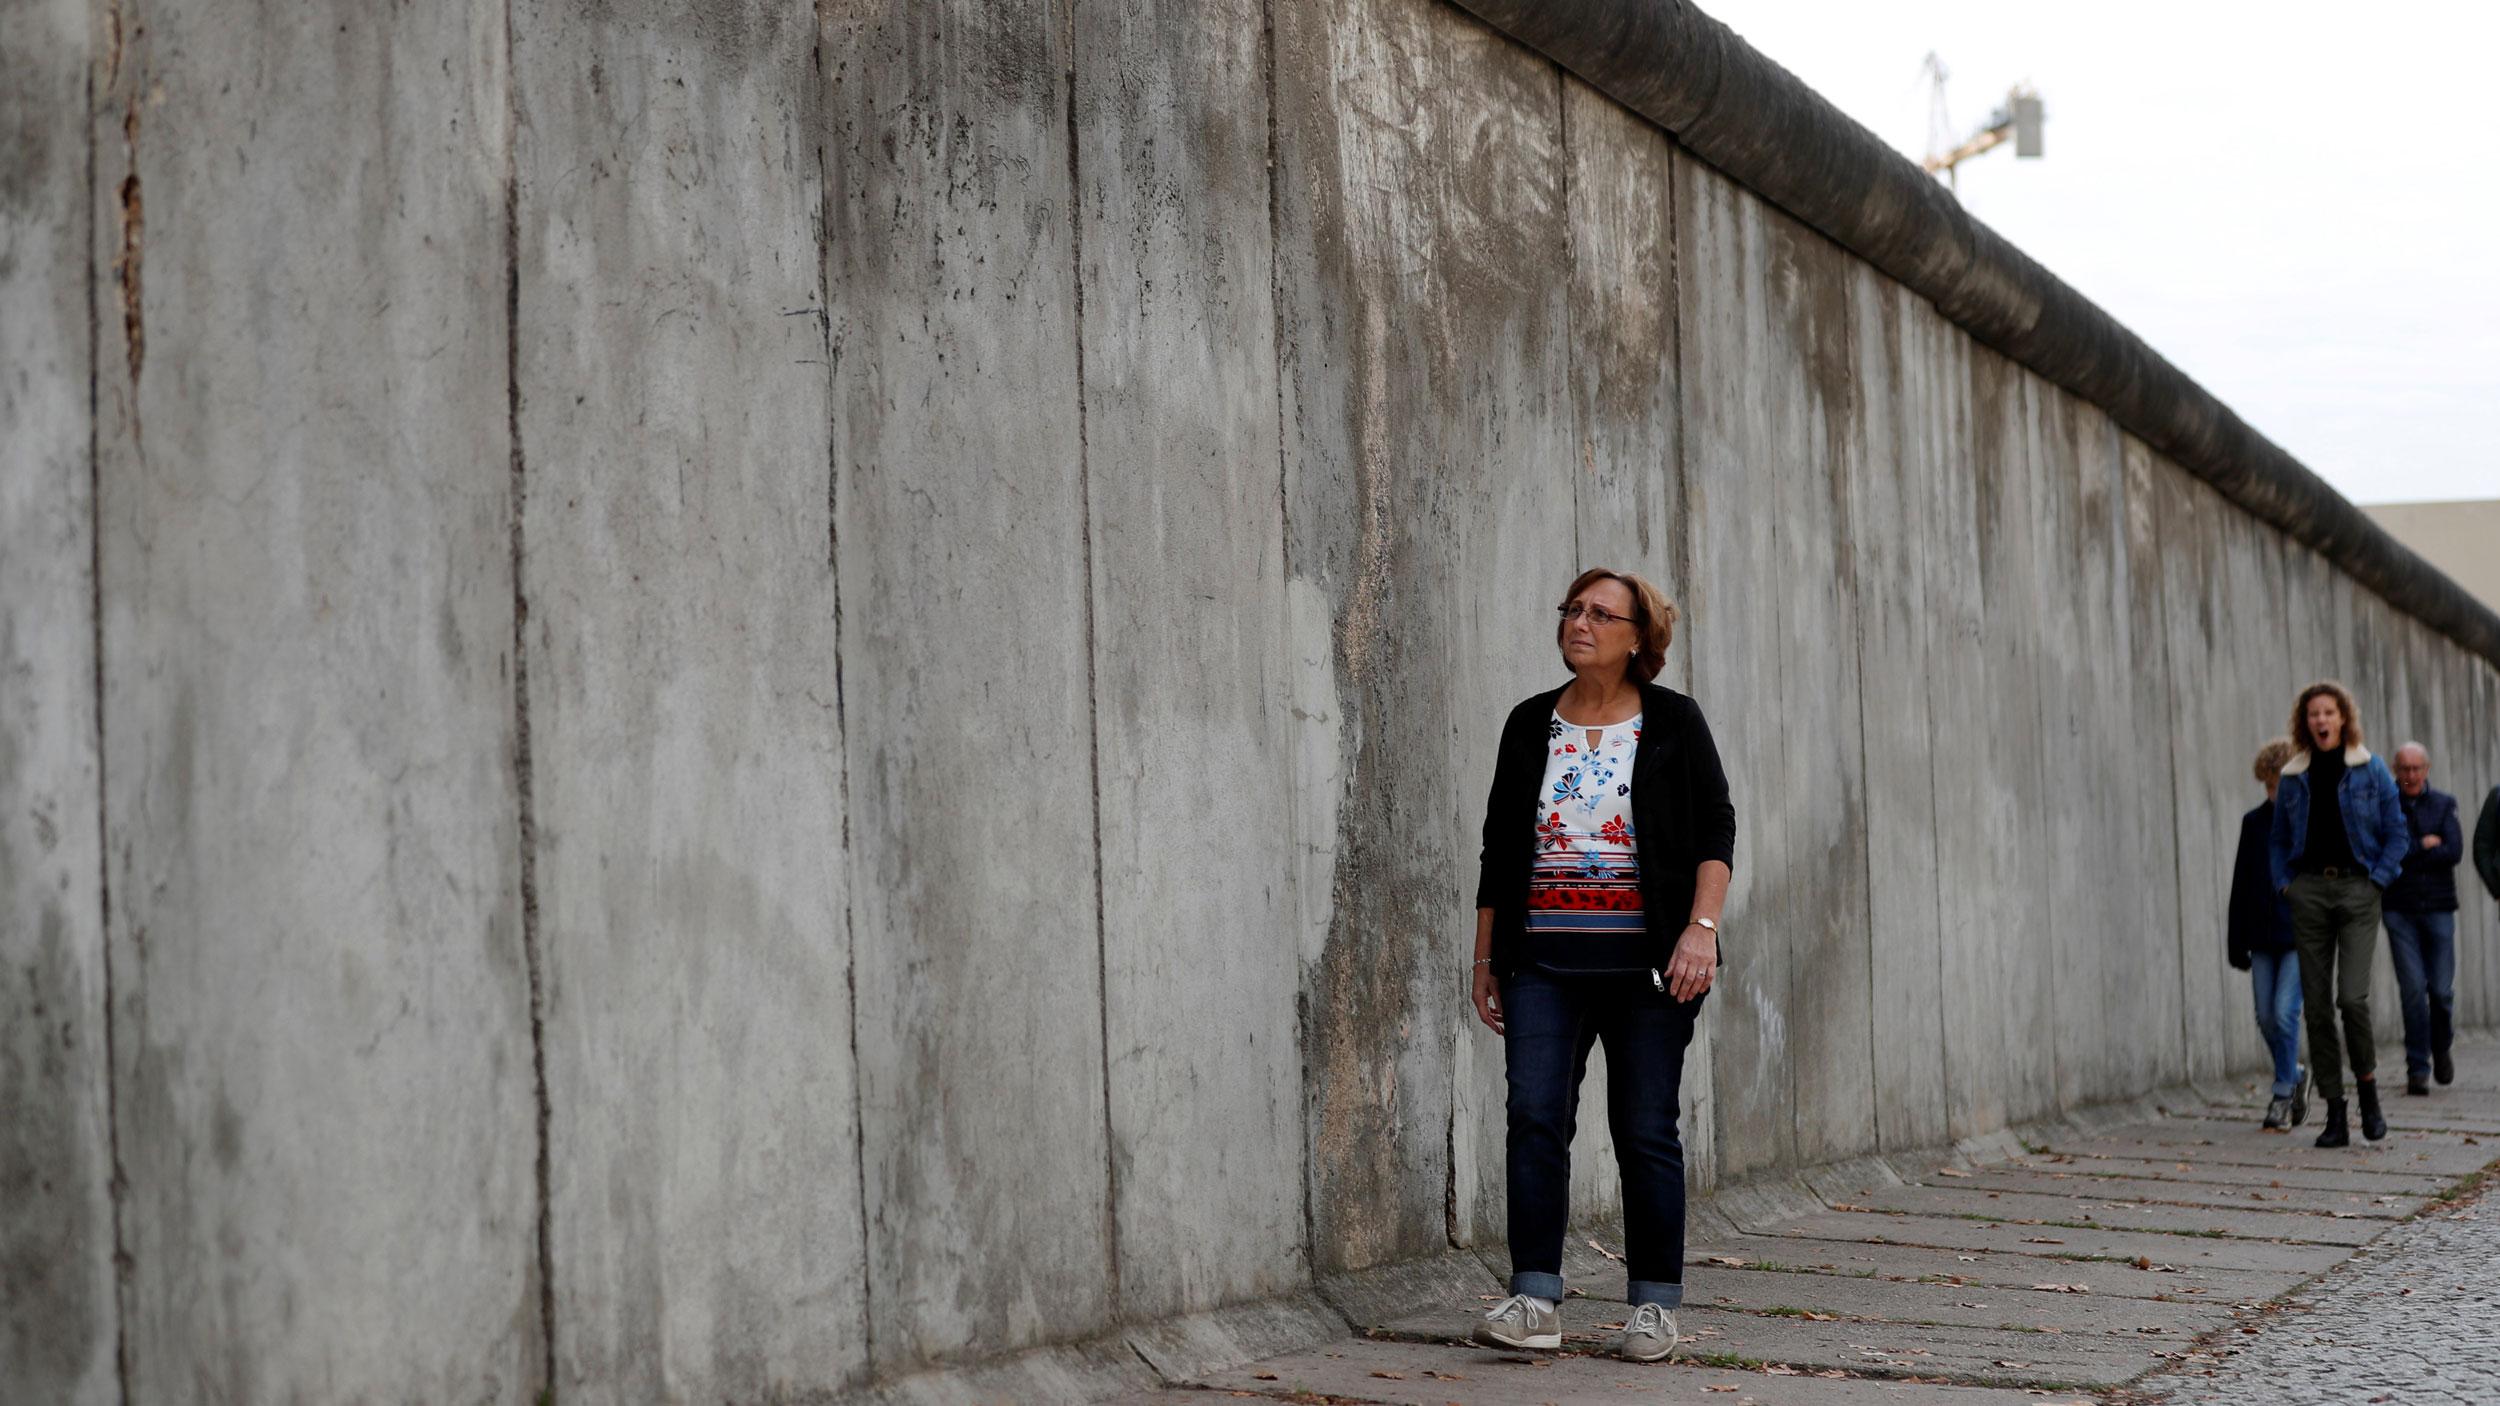 A woman walks along a tall concrete wall